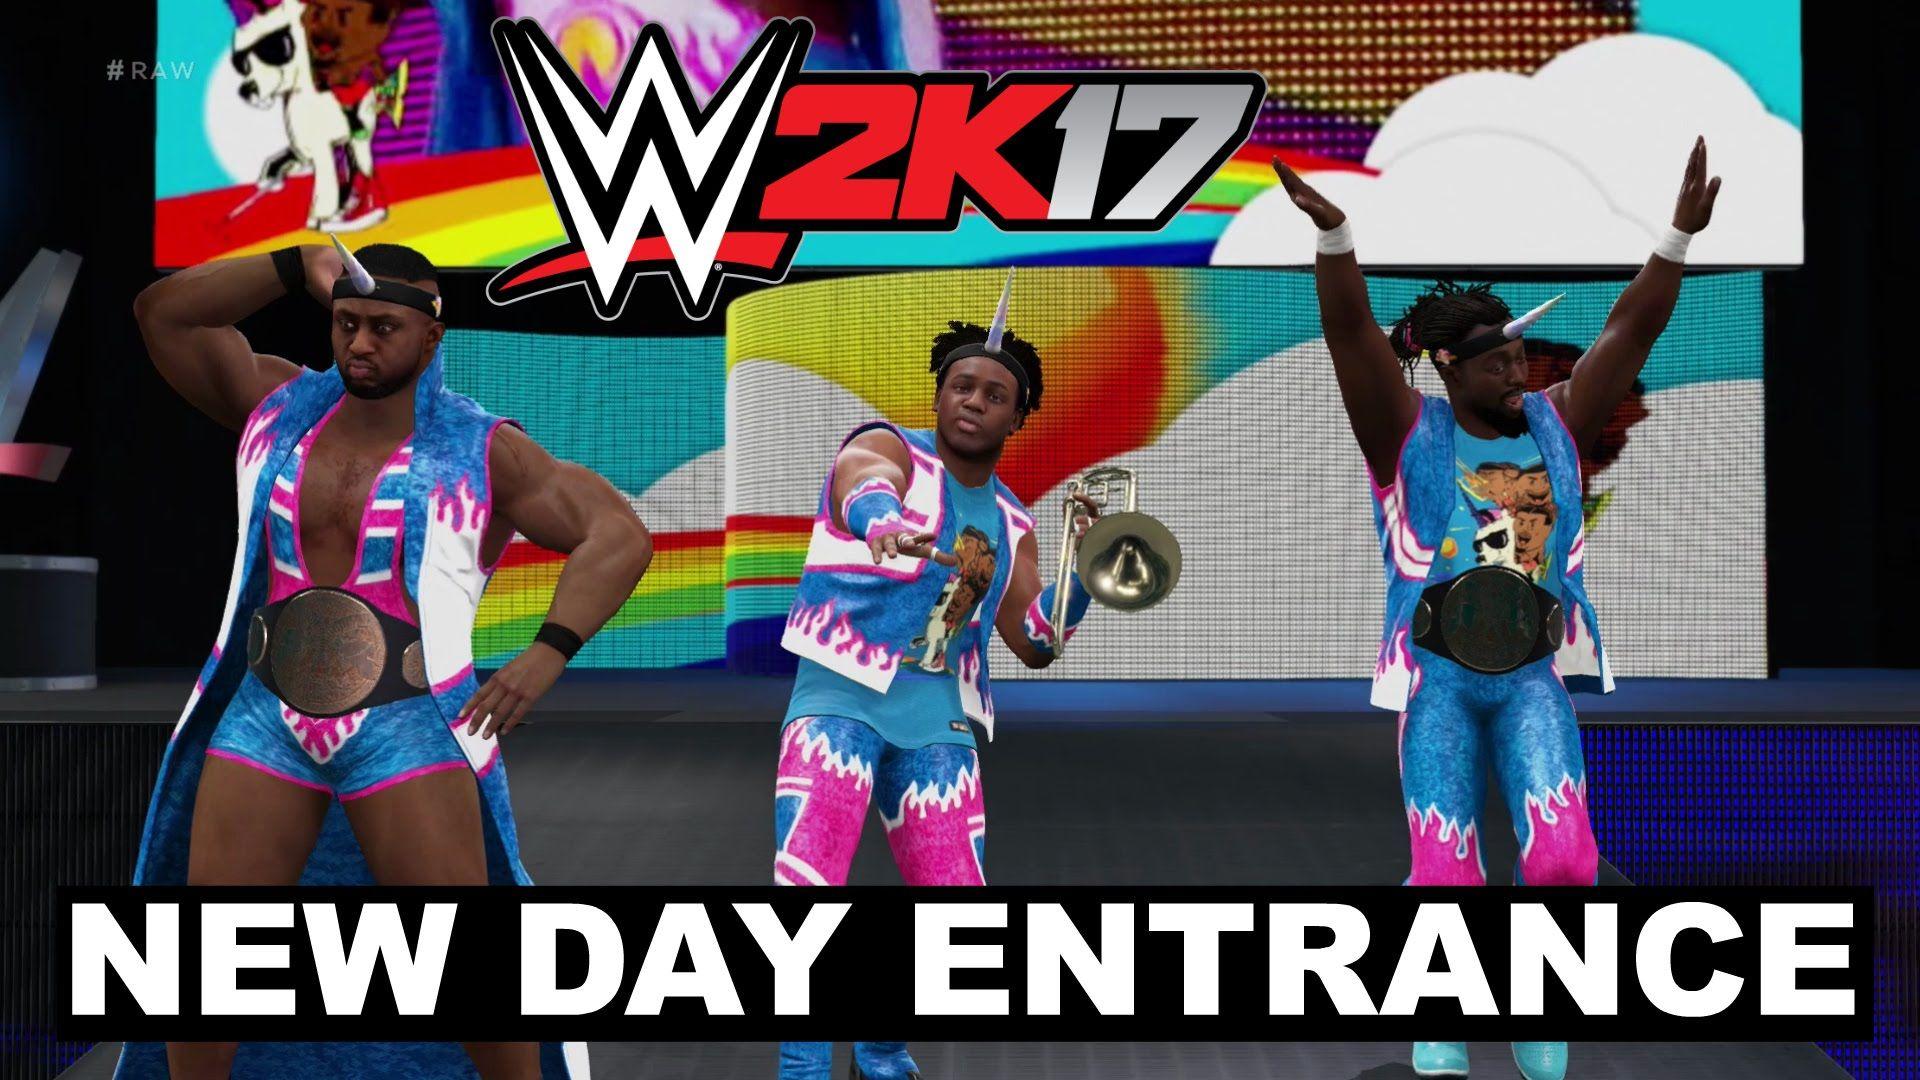 WWE 2K17 New Day Entrance | weeks in wwe 7/7/15 - | Wwe, New